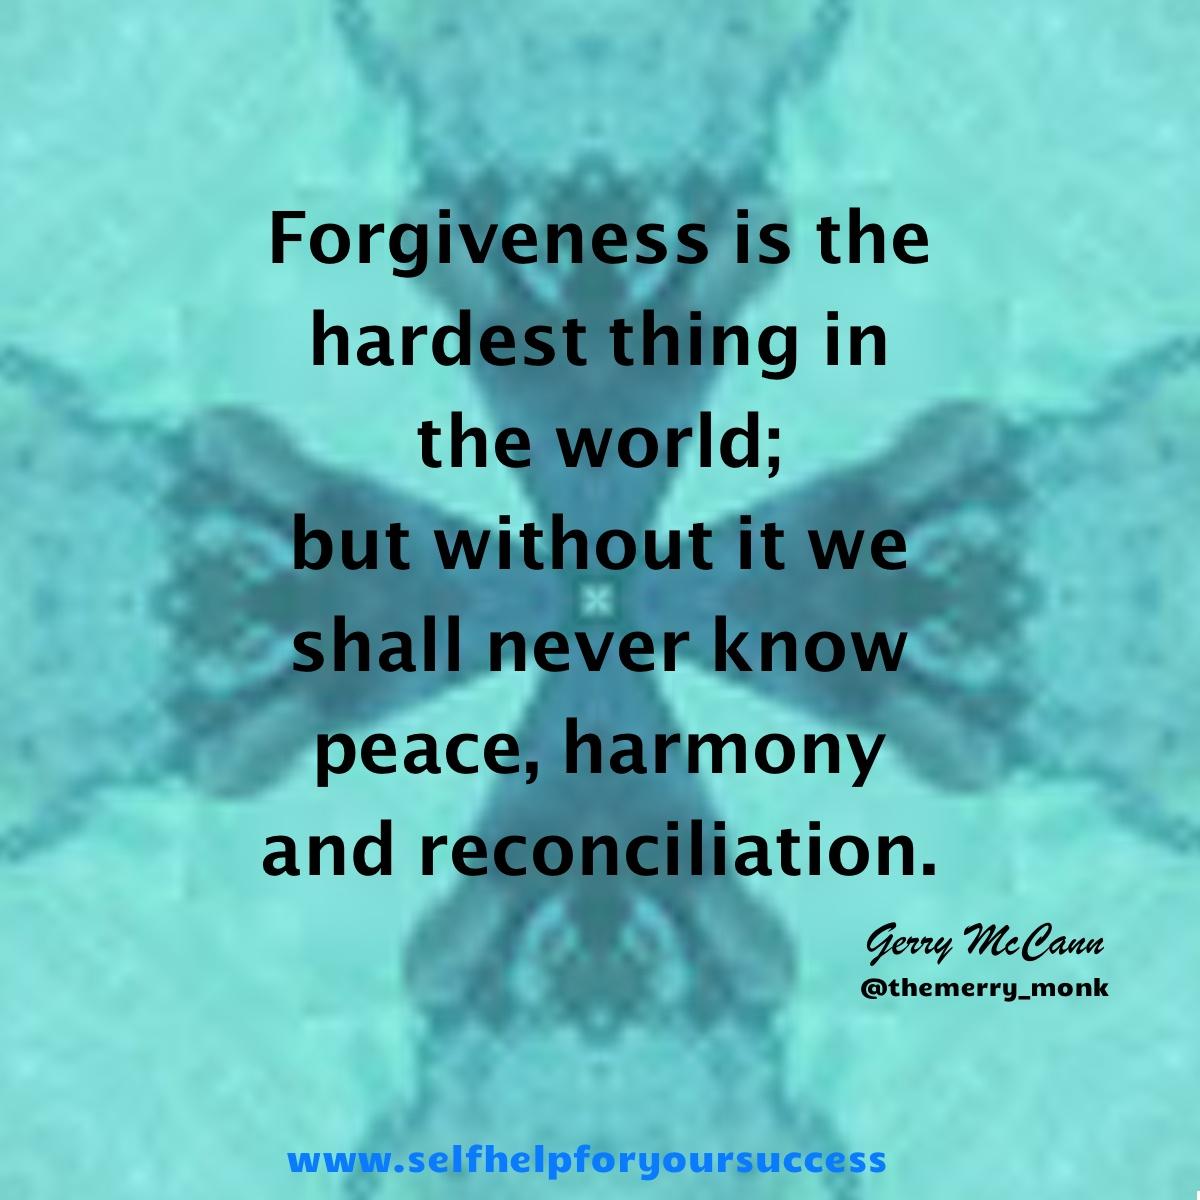 RT @themerry_monk: Forgiveness  #personalgrowth  #spiritualgrowth https://t.co/HnSiKhM0SX